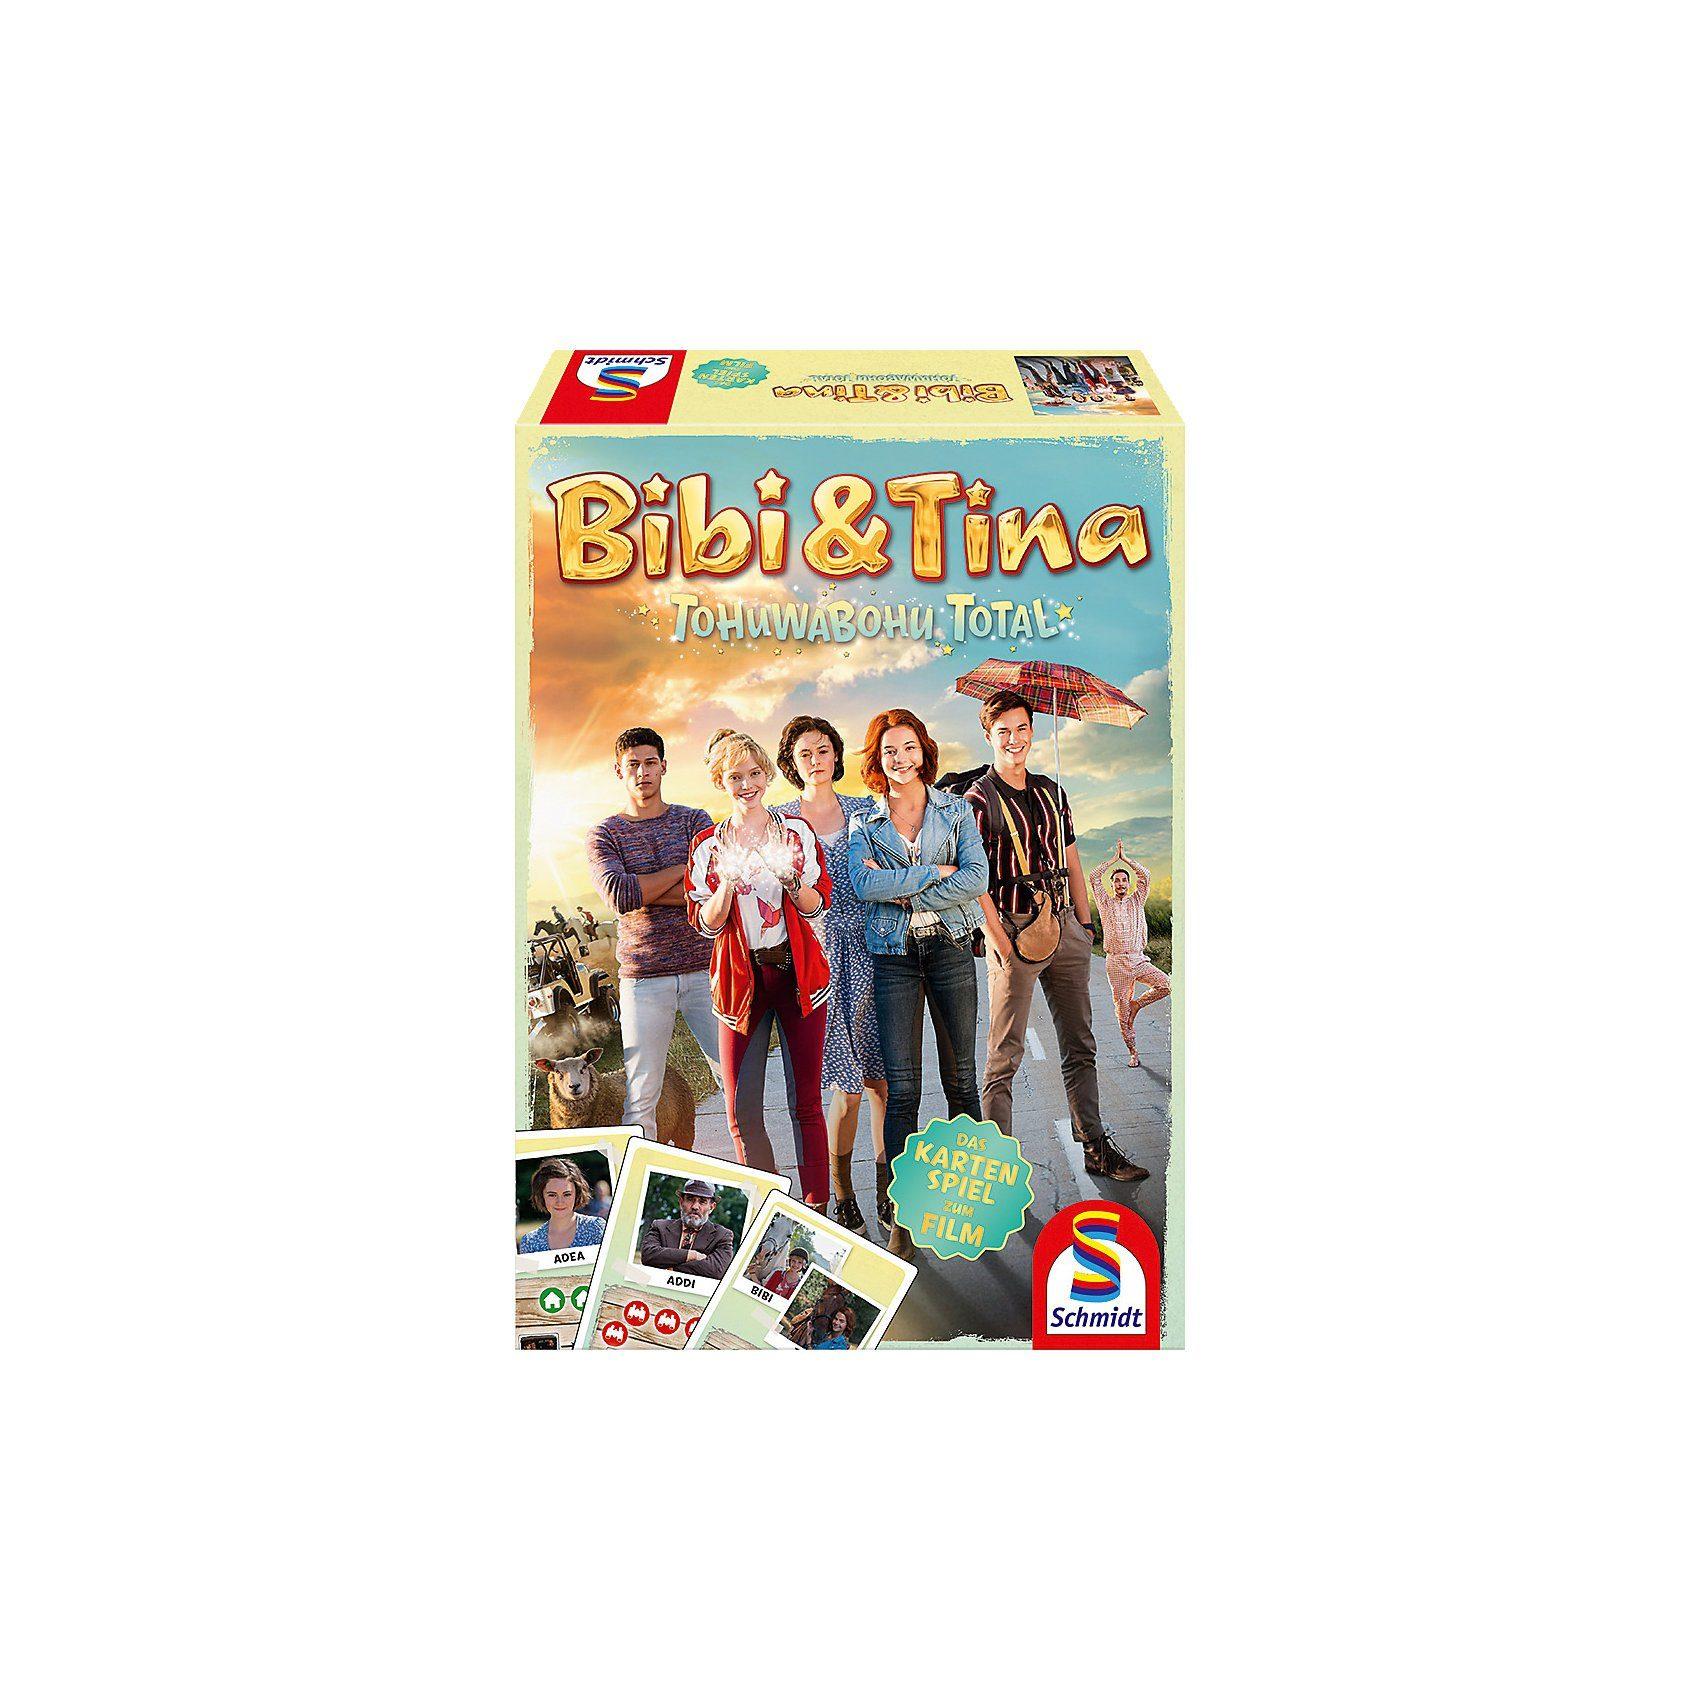 Schmidt Spiele Bibi & Tina, Tohuwabohu Total, Das Kartenspiel zum Kinofilm